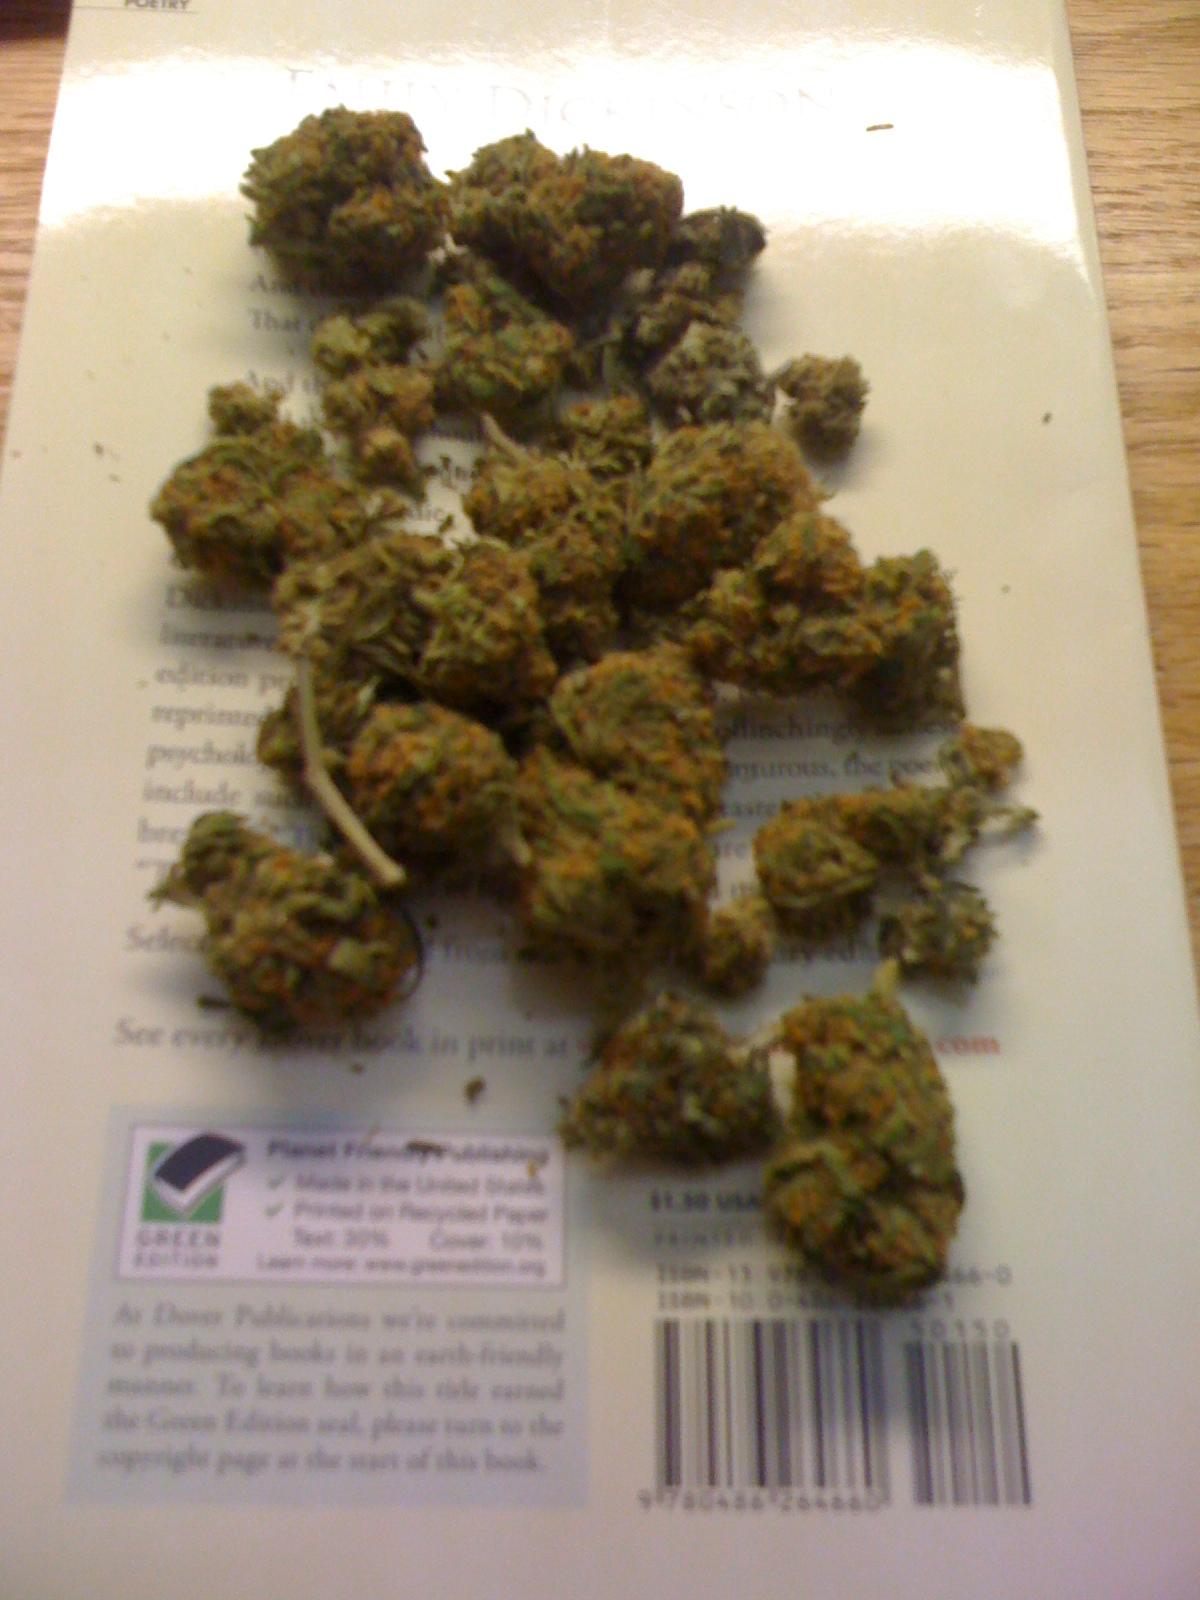 Lil Wayne Smoking ColorfulLil Wayne Smoking Colorful Weed